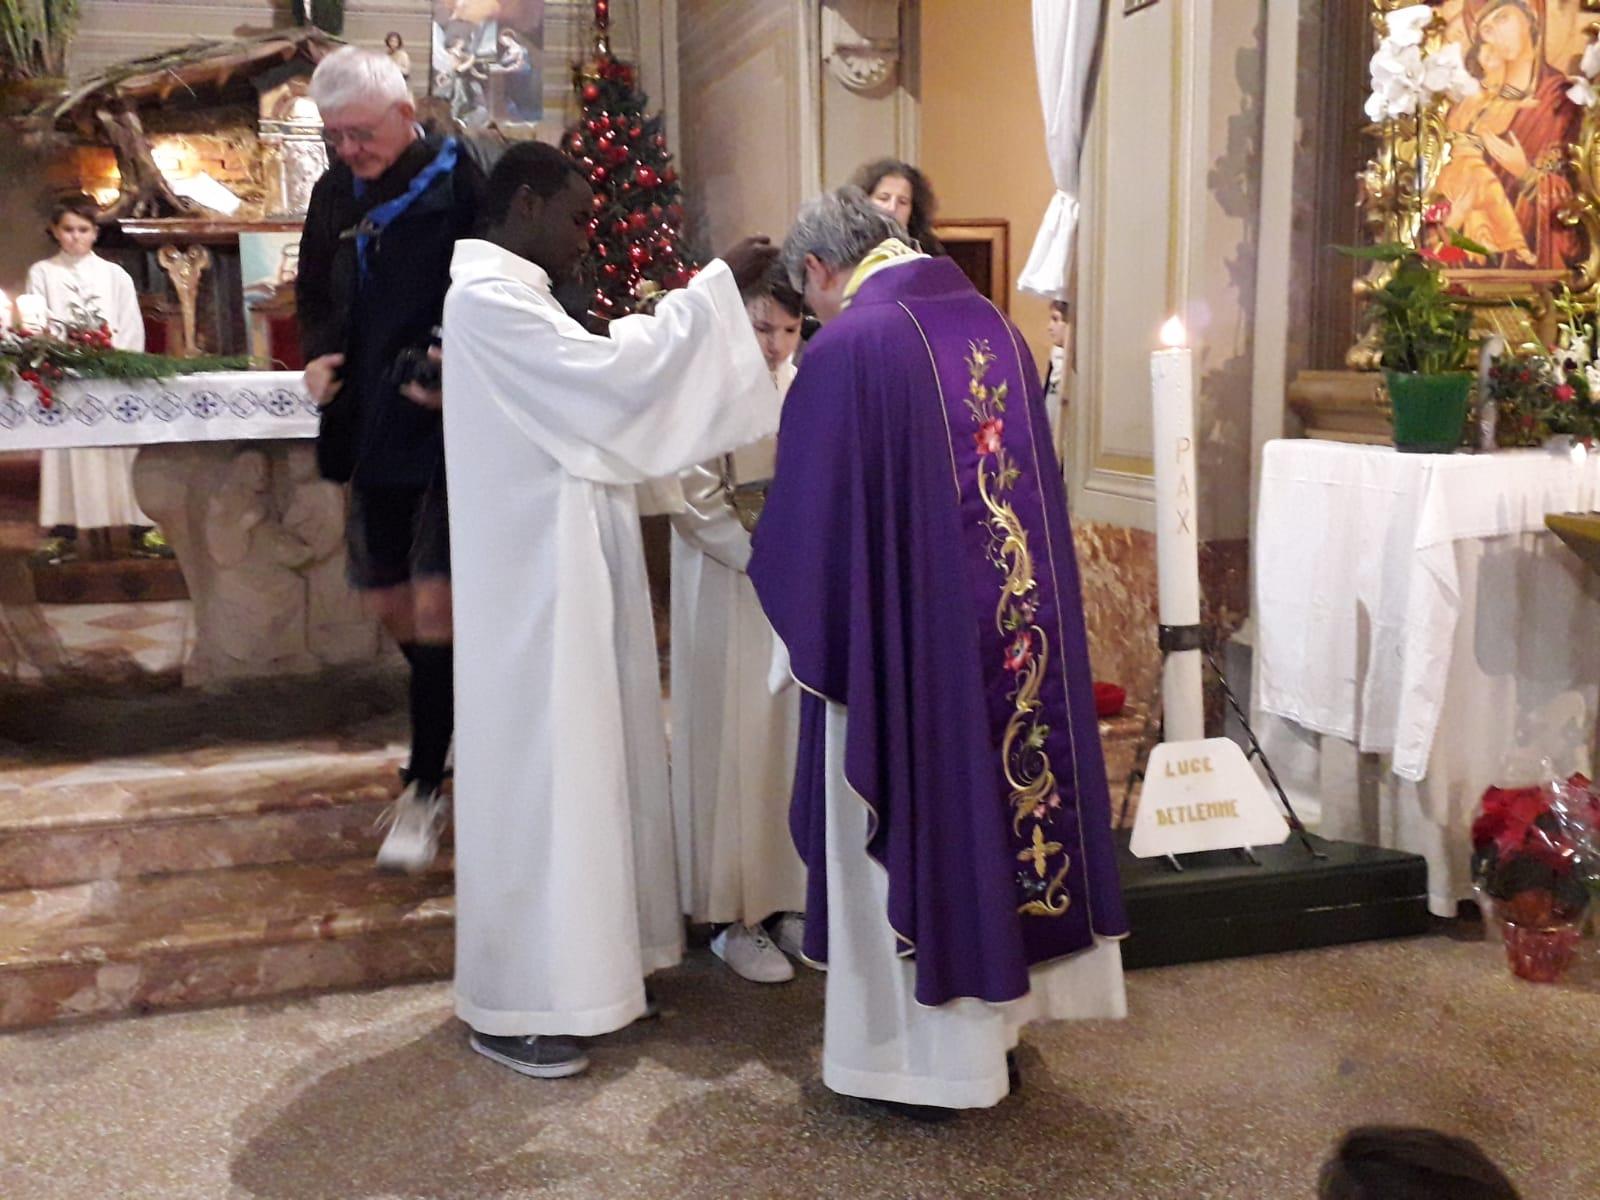 Luce di Betlemme 2019 santa messa (29)